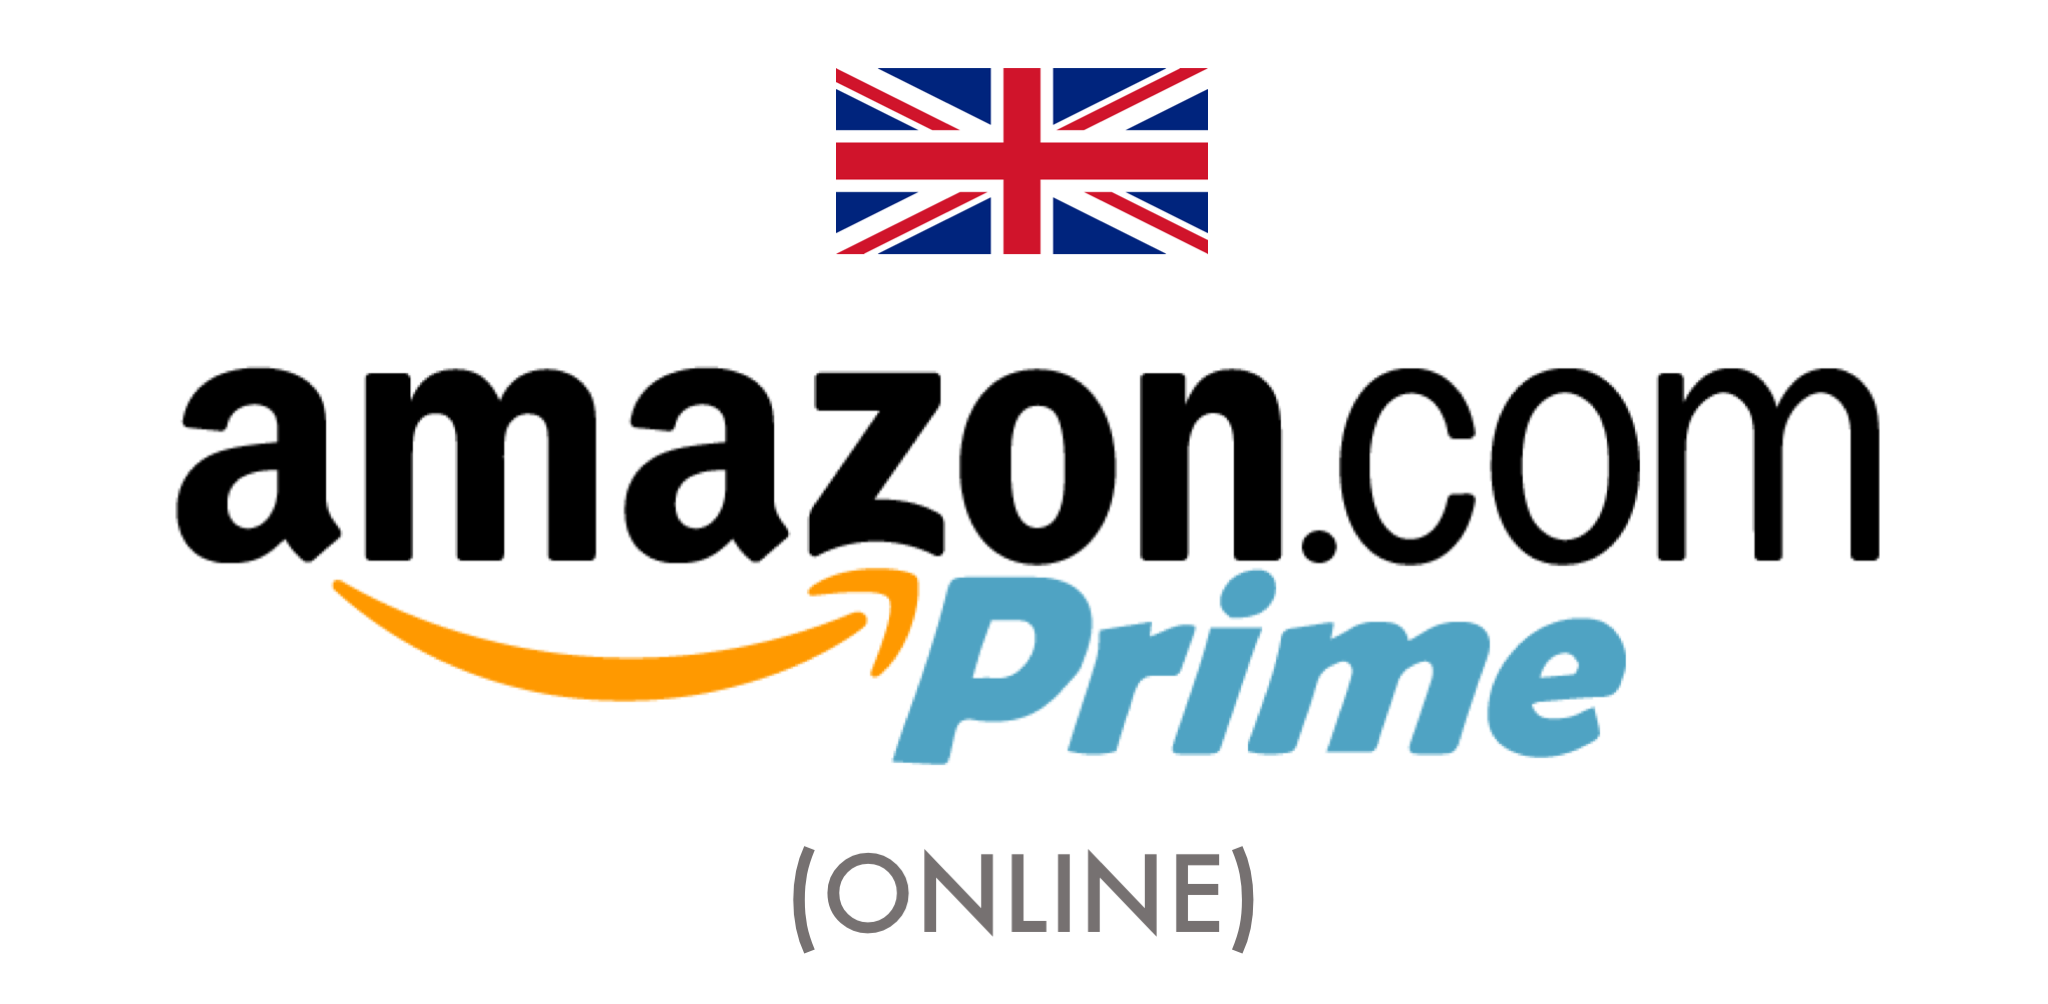 Retailer Image - Amazon v2.png